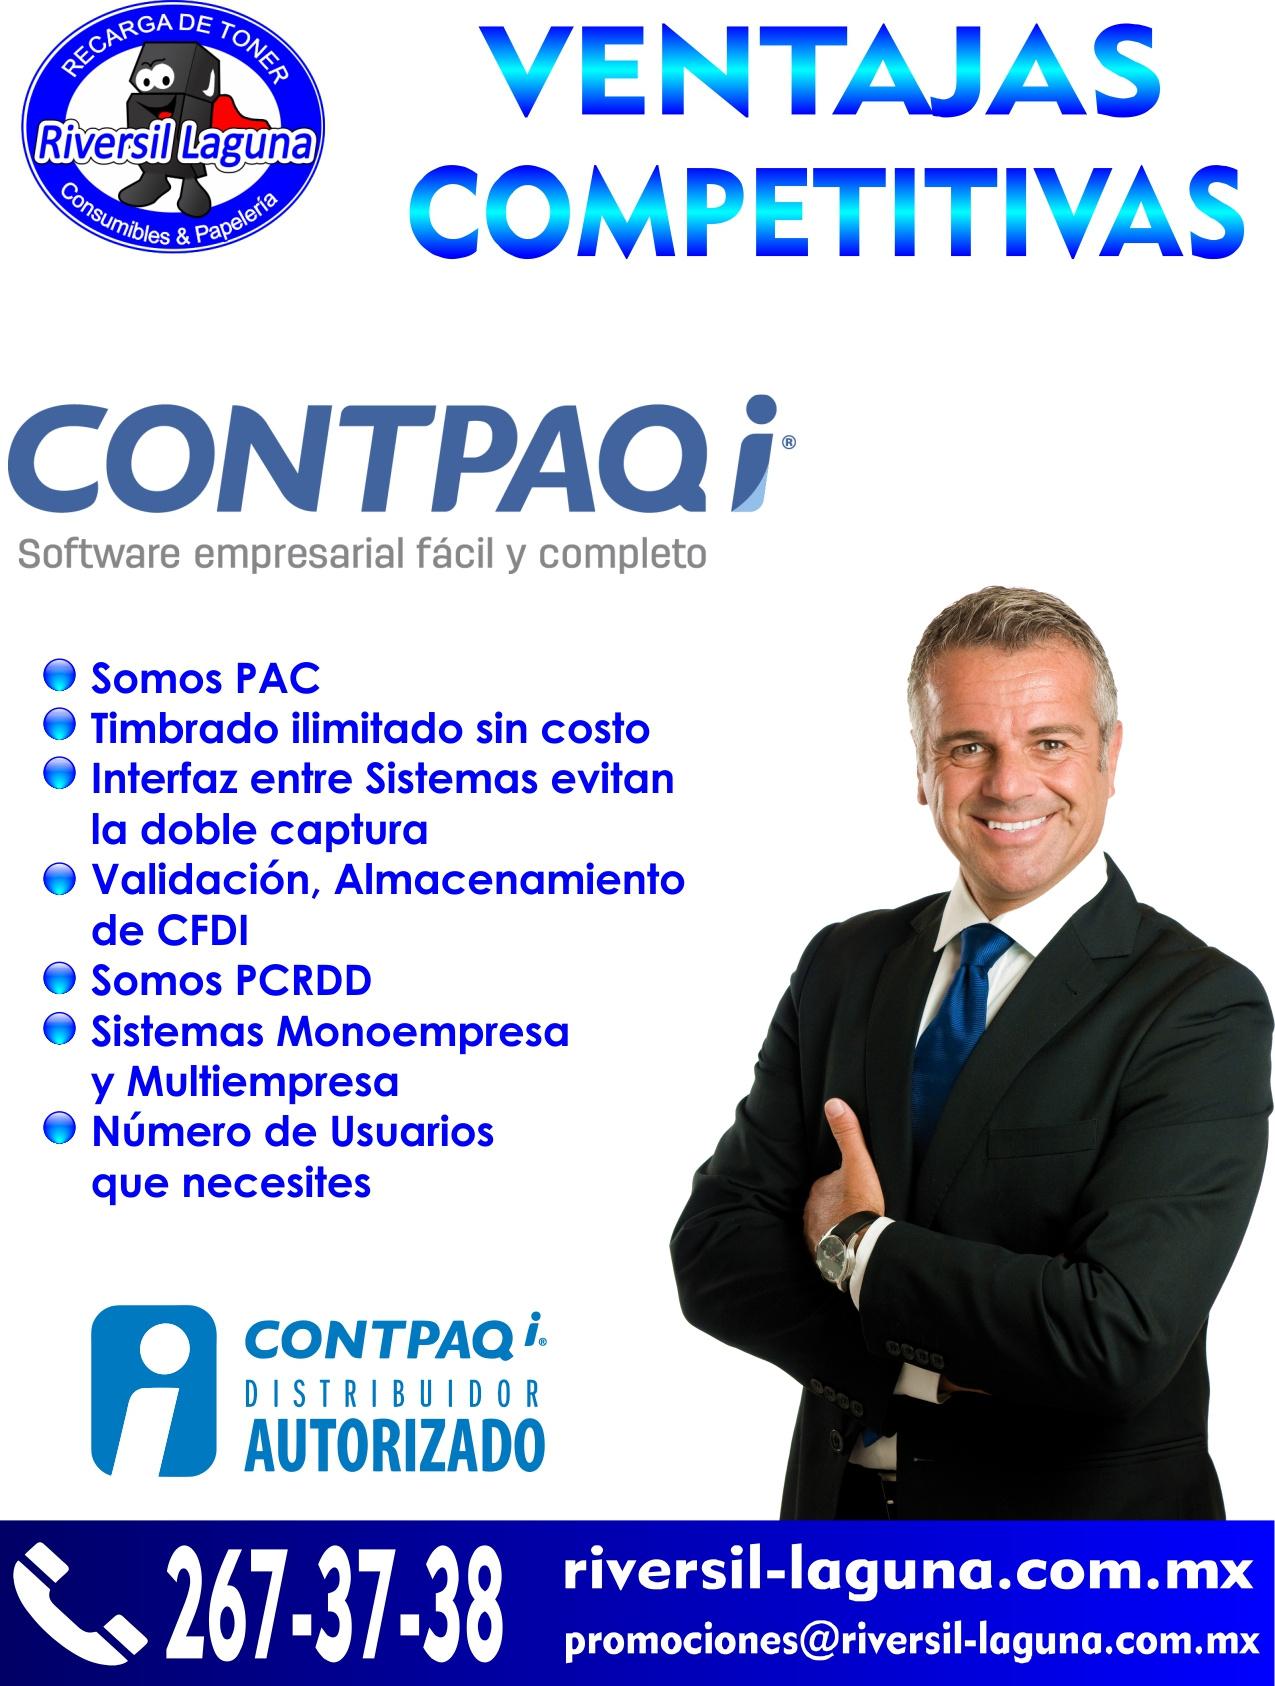 ventajas compatitivas contpaqi